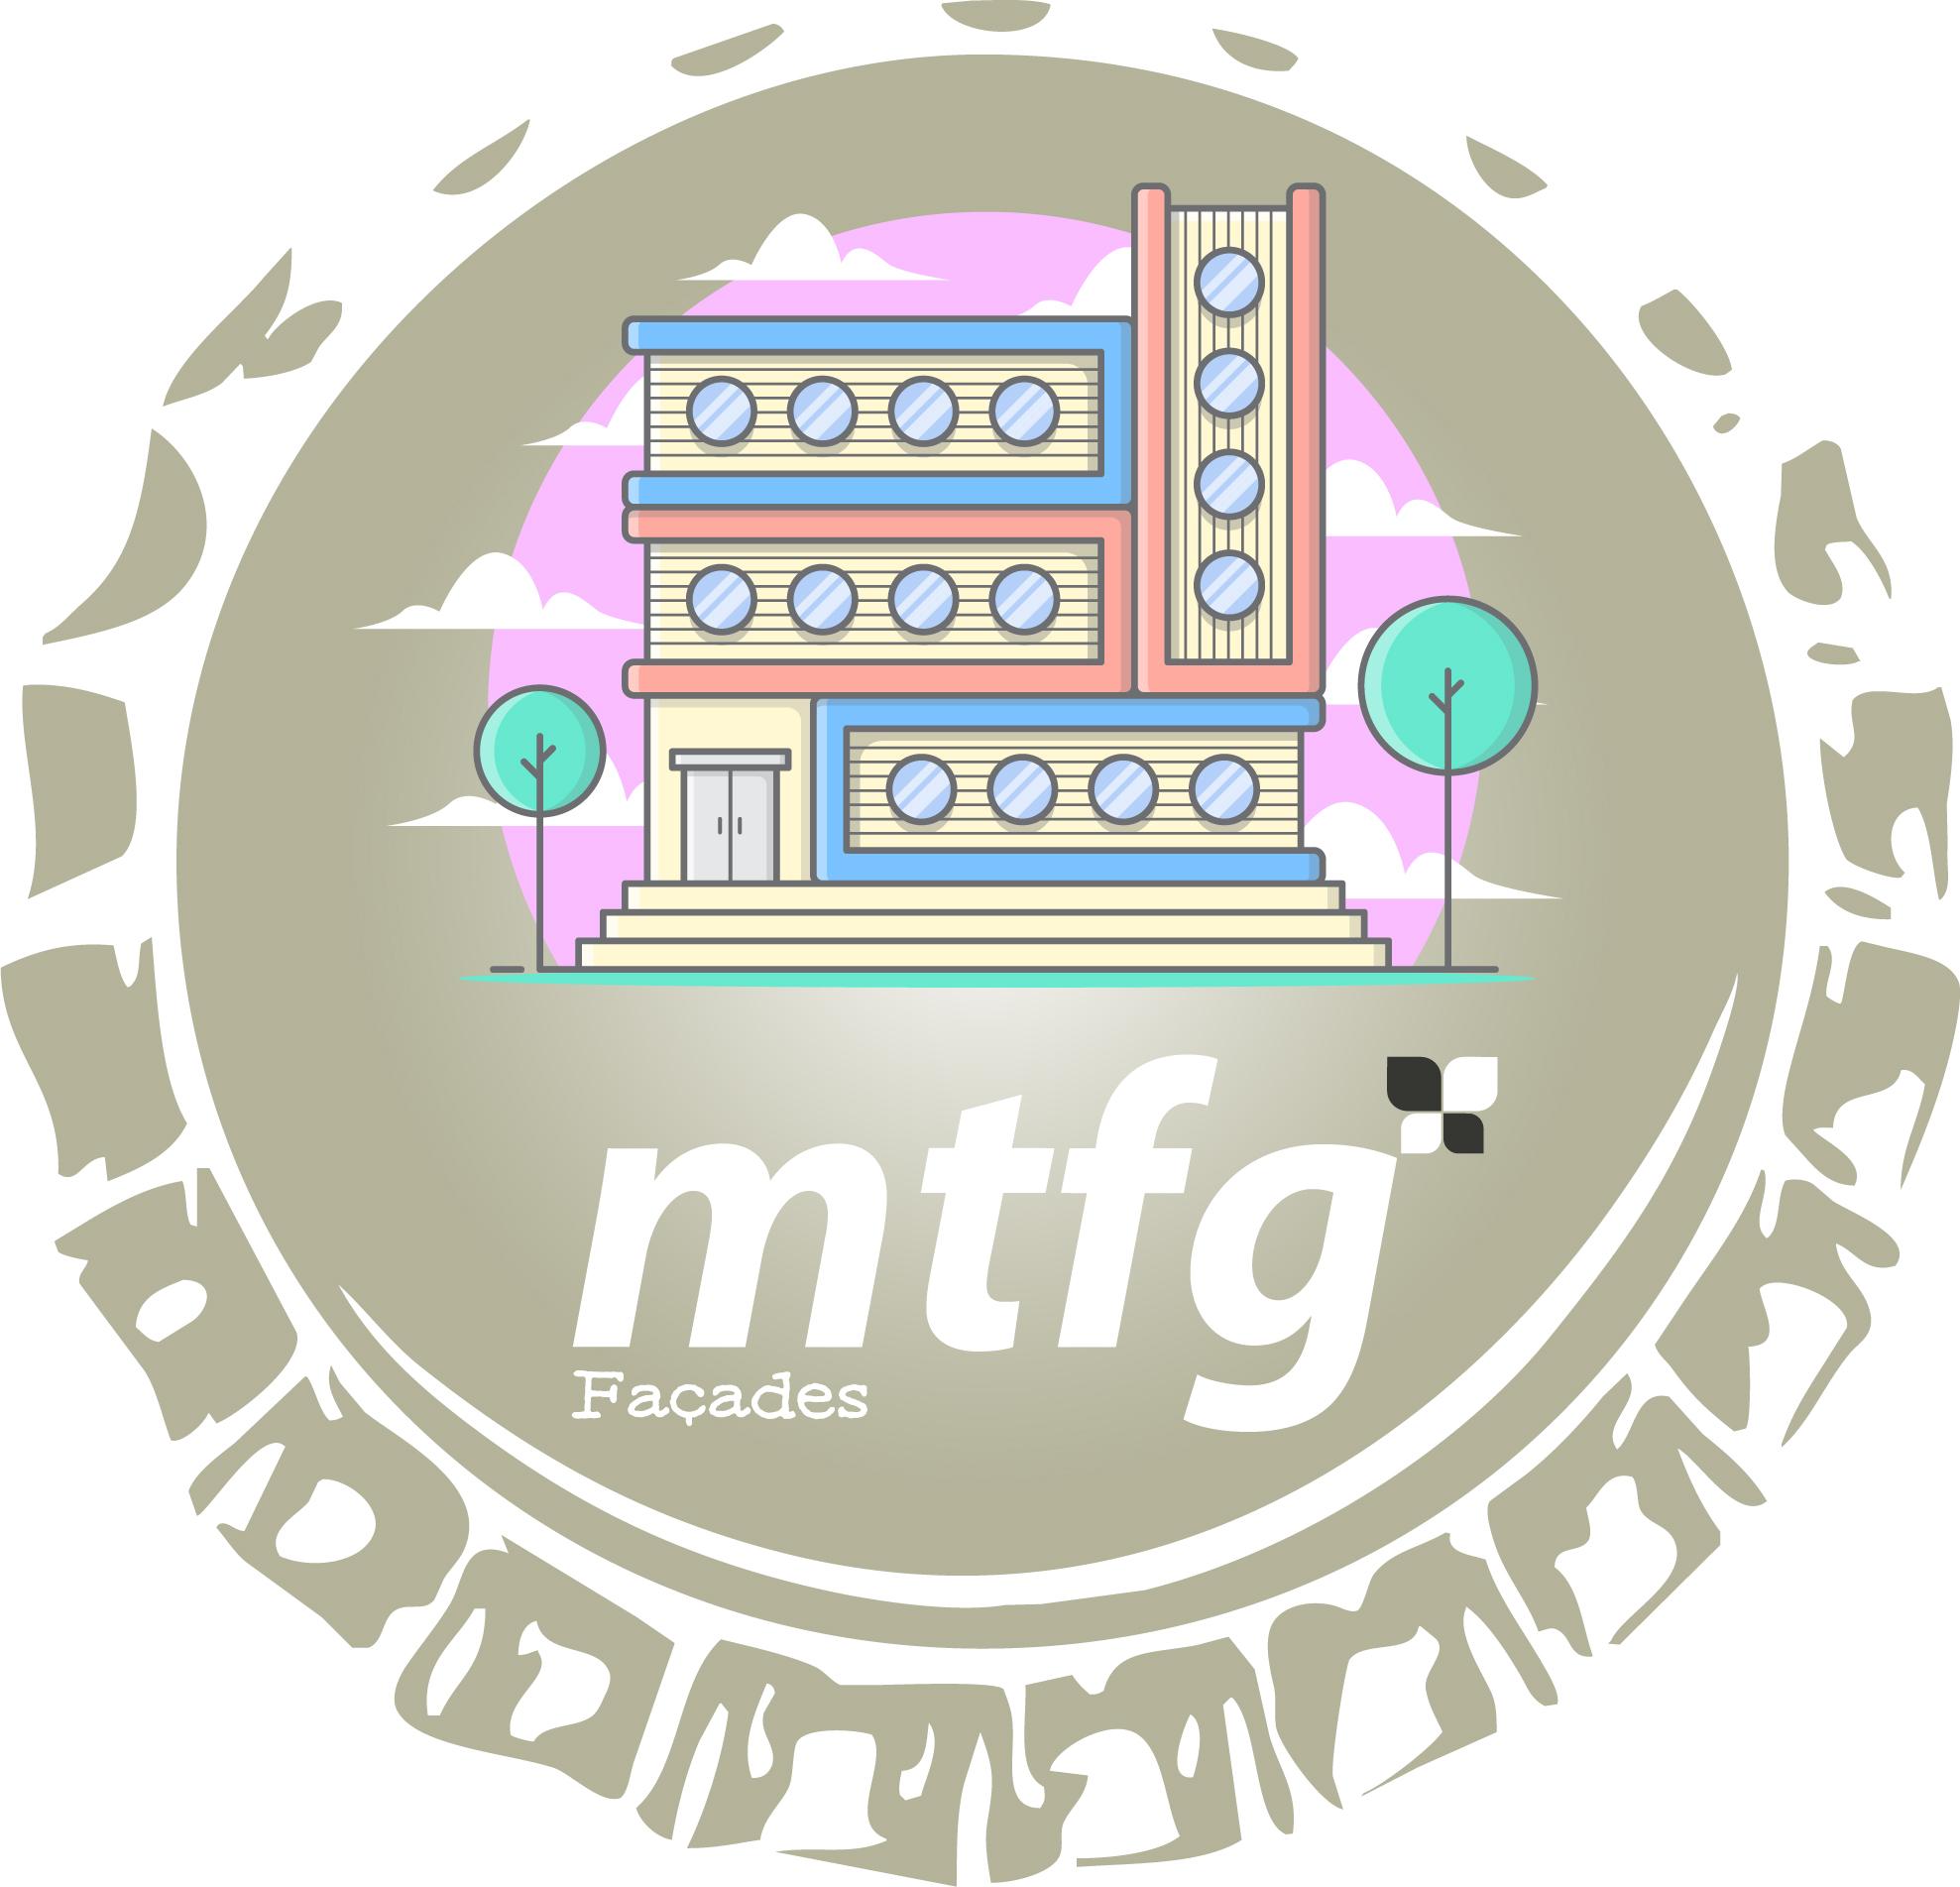 MTFG Façades